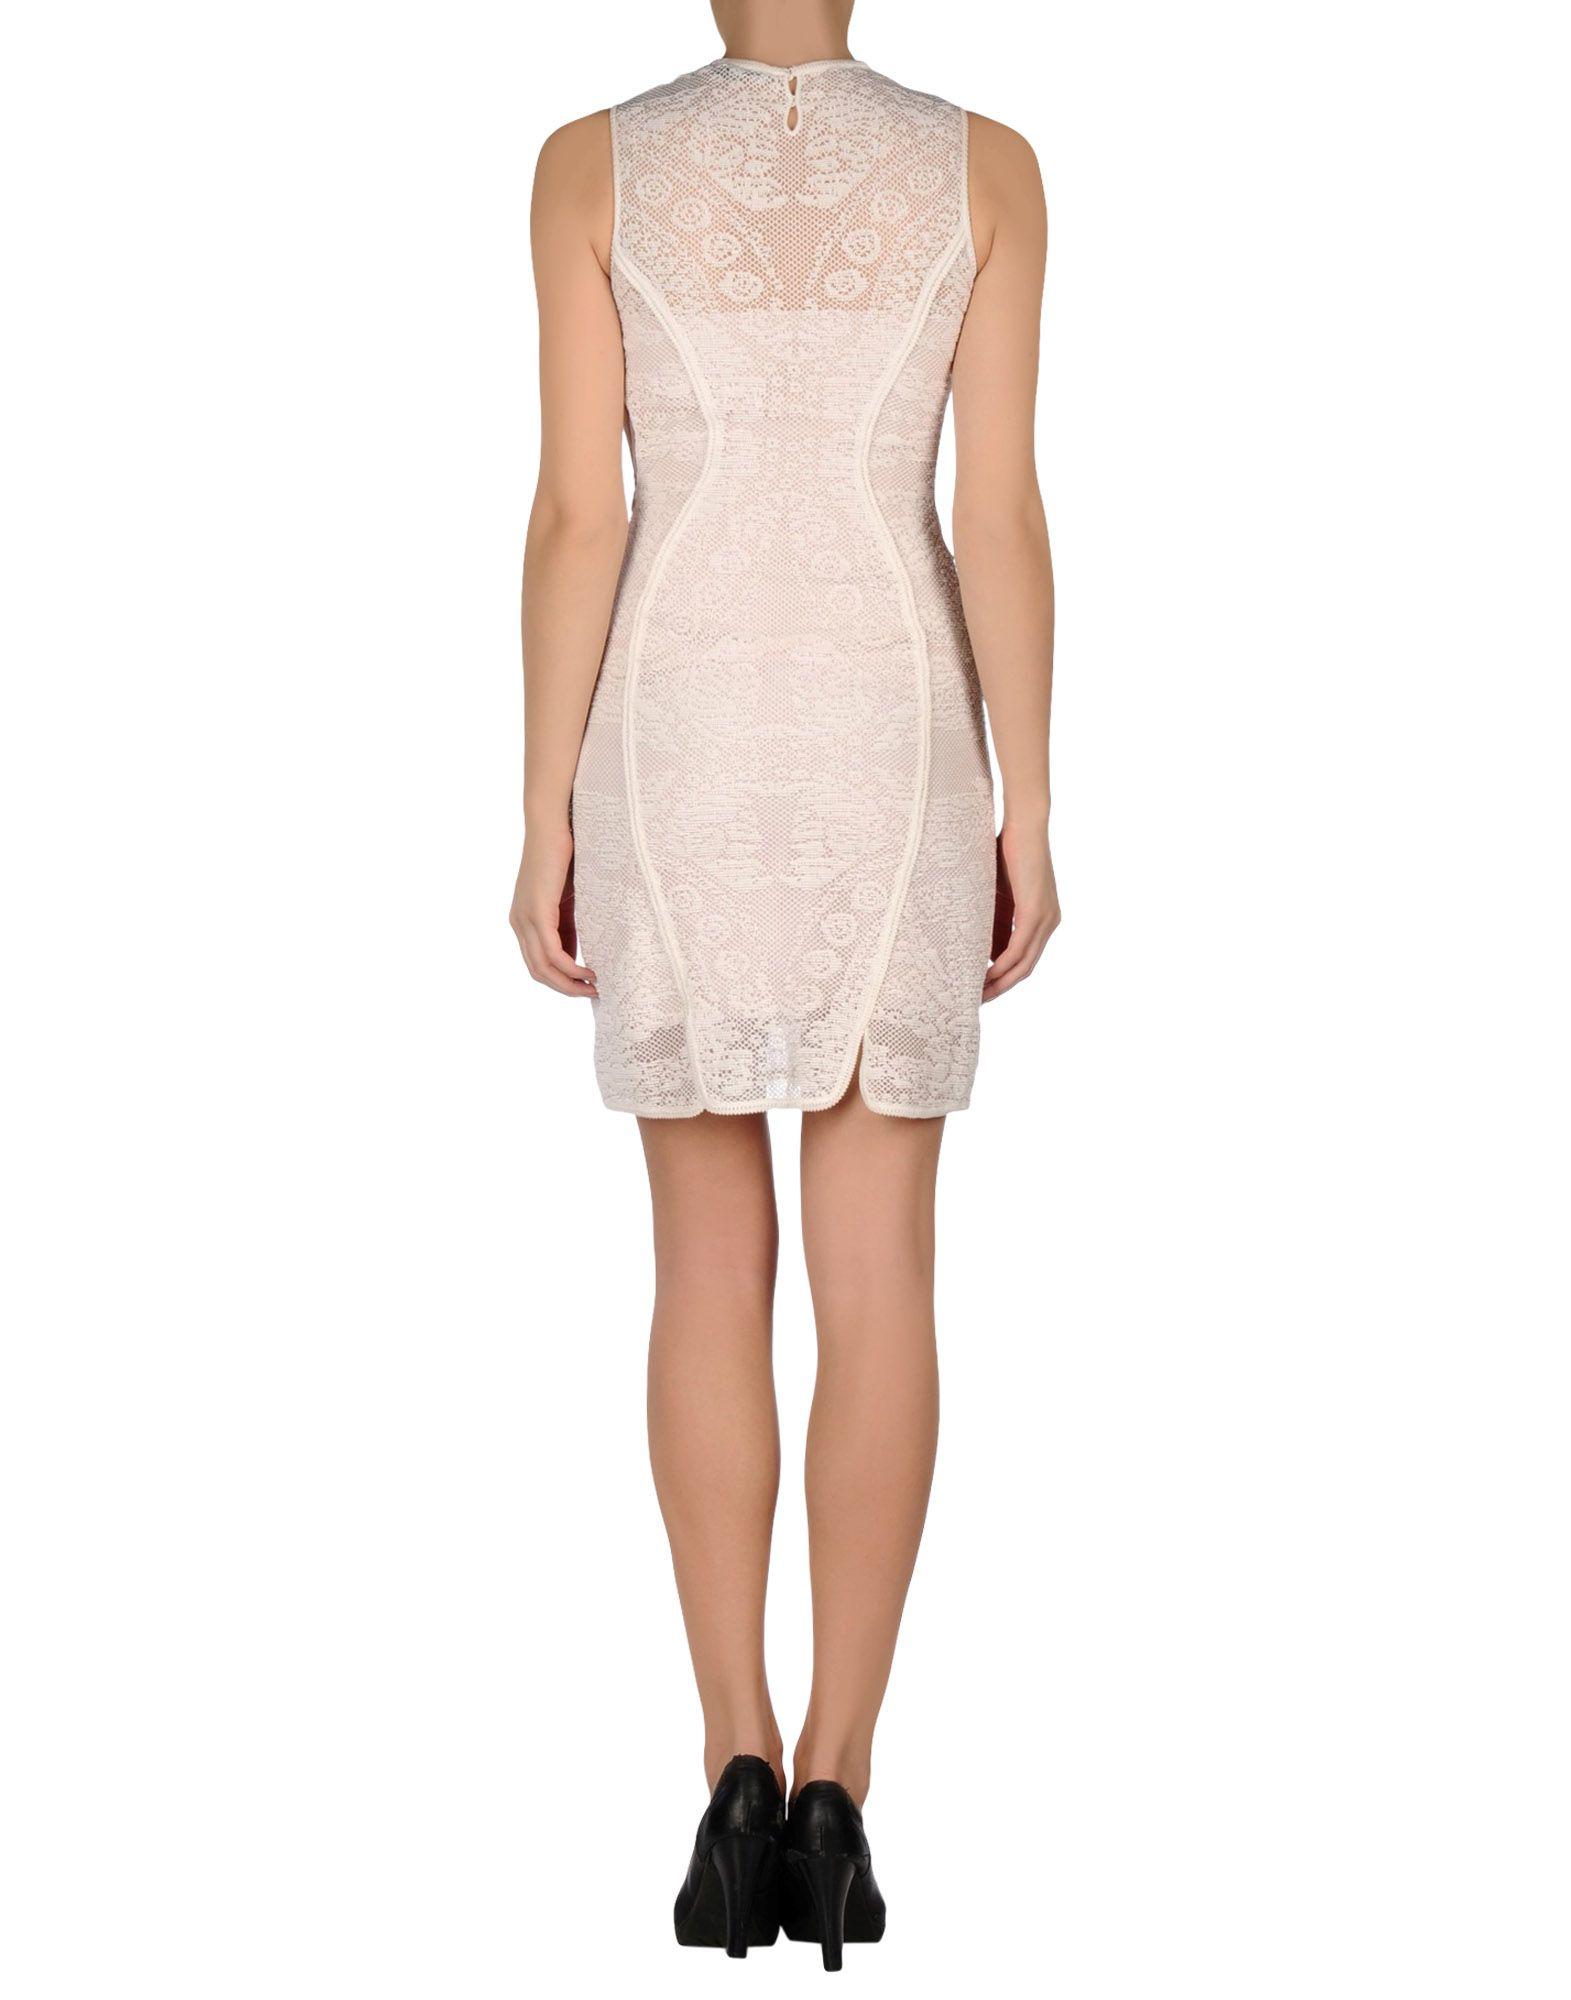 dior short dresses - photo #7